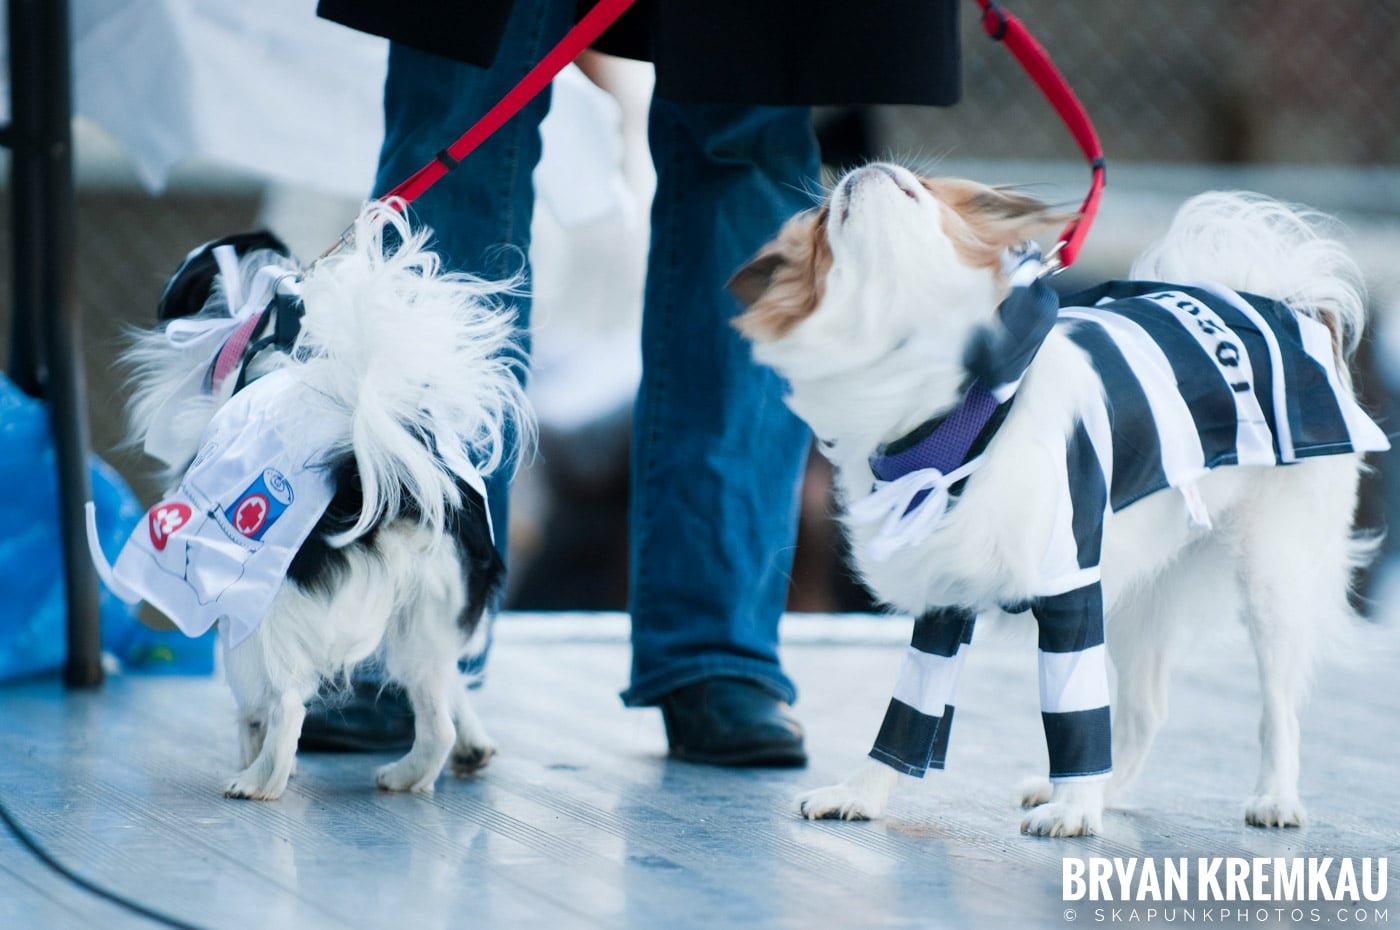 Paulus Hook Halloween Pet Parade 2011 @ Jersey City, NJ - 10.30.11 (9)